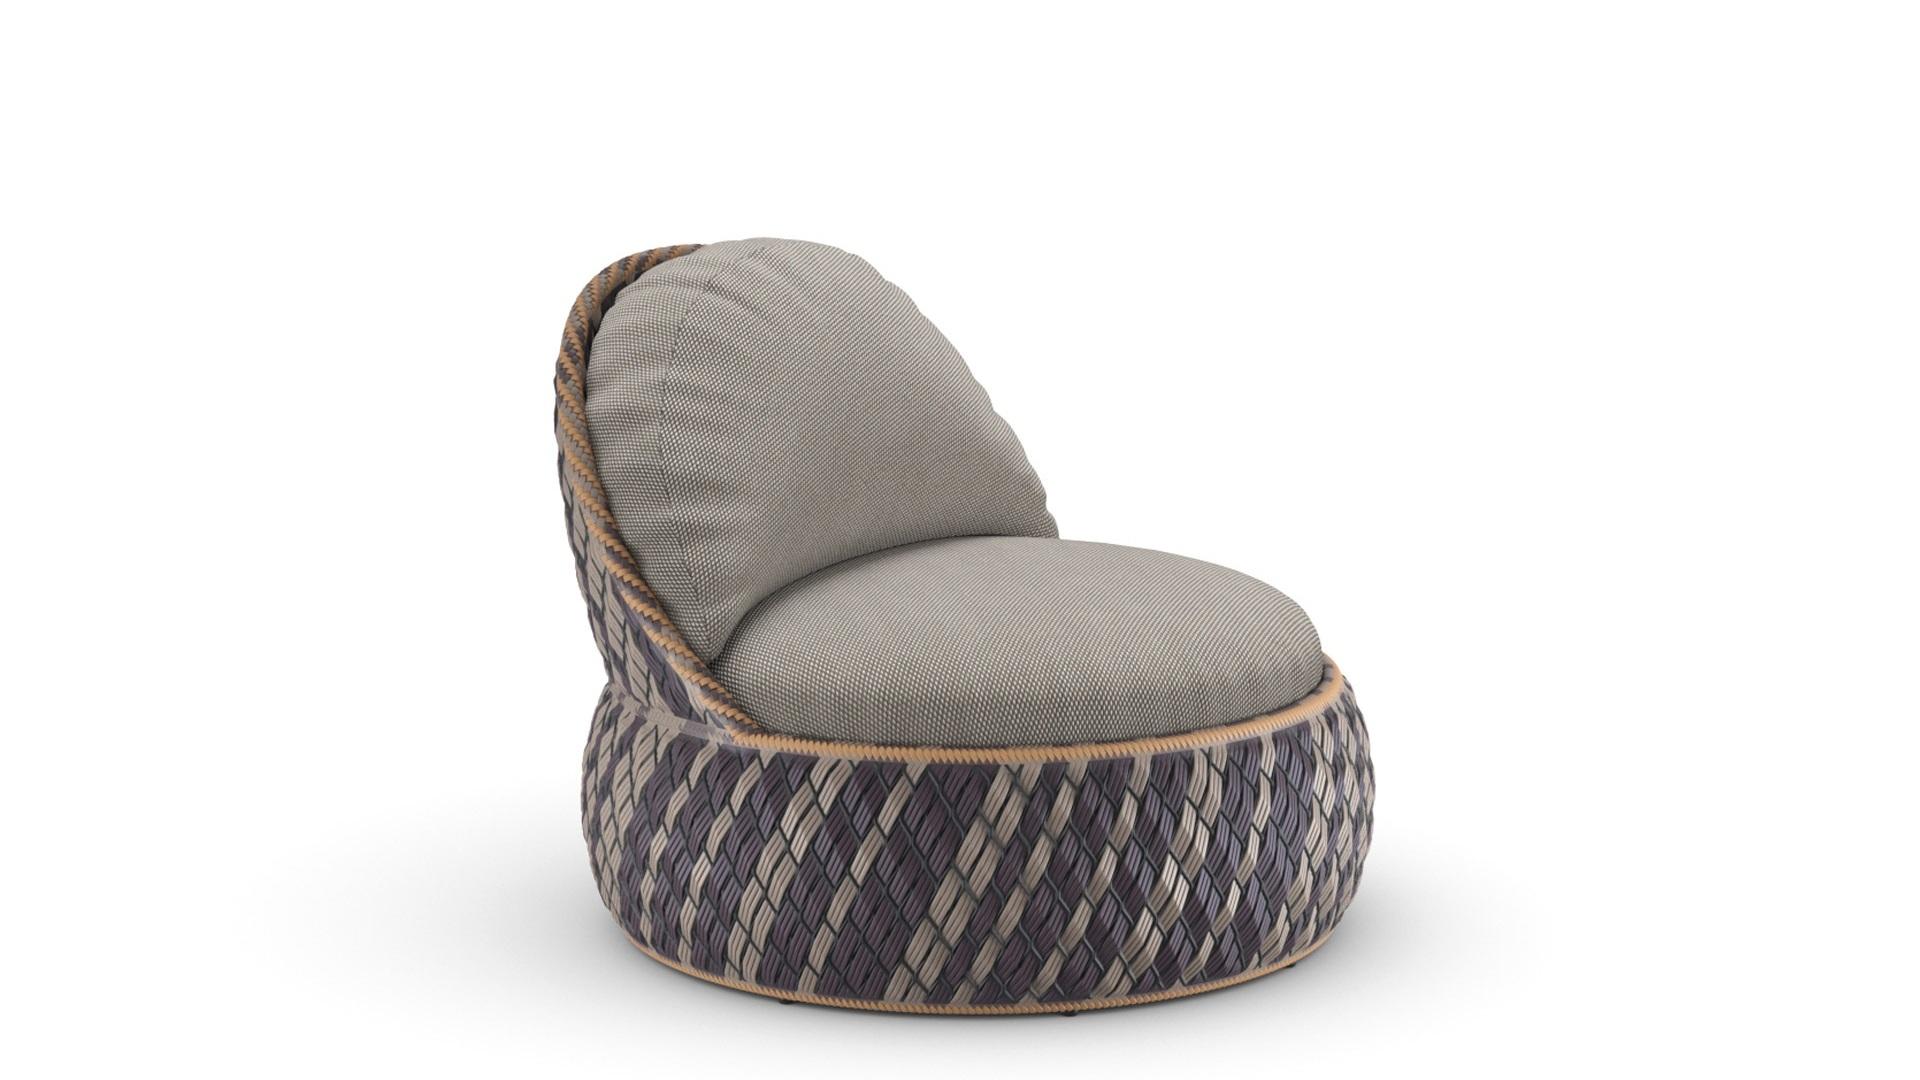 DEDON-DALA-Lounge-chair-rioja-cool-taupe.jpg